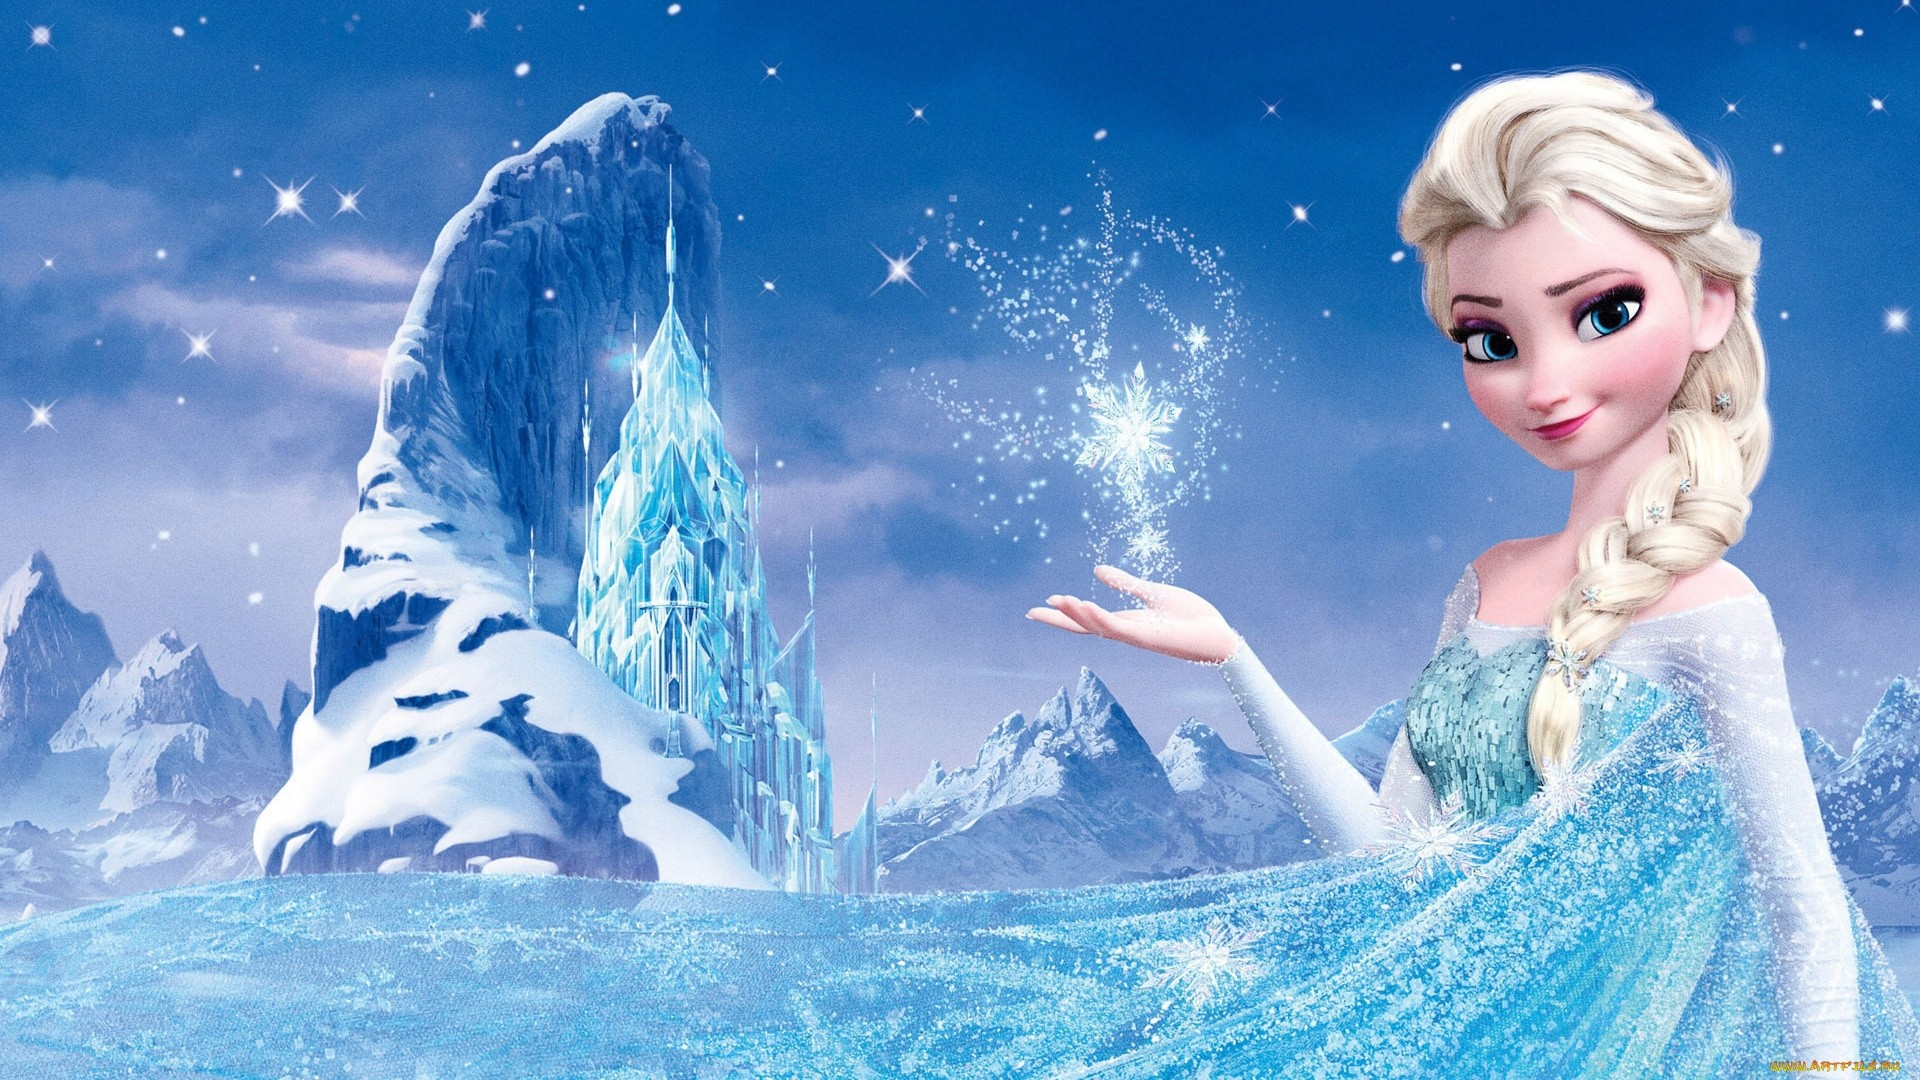 Frozen 2 PC Wallpaper